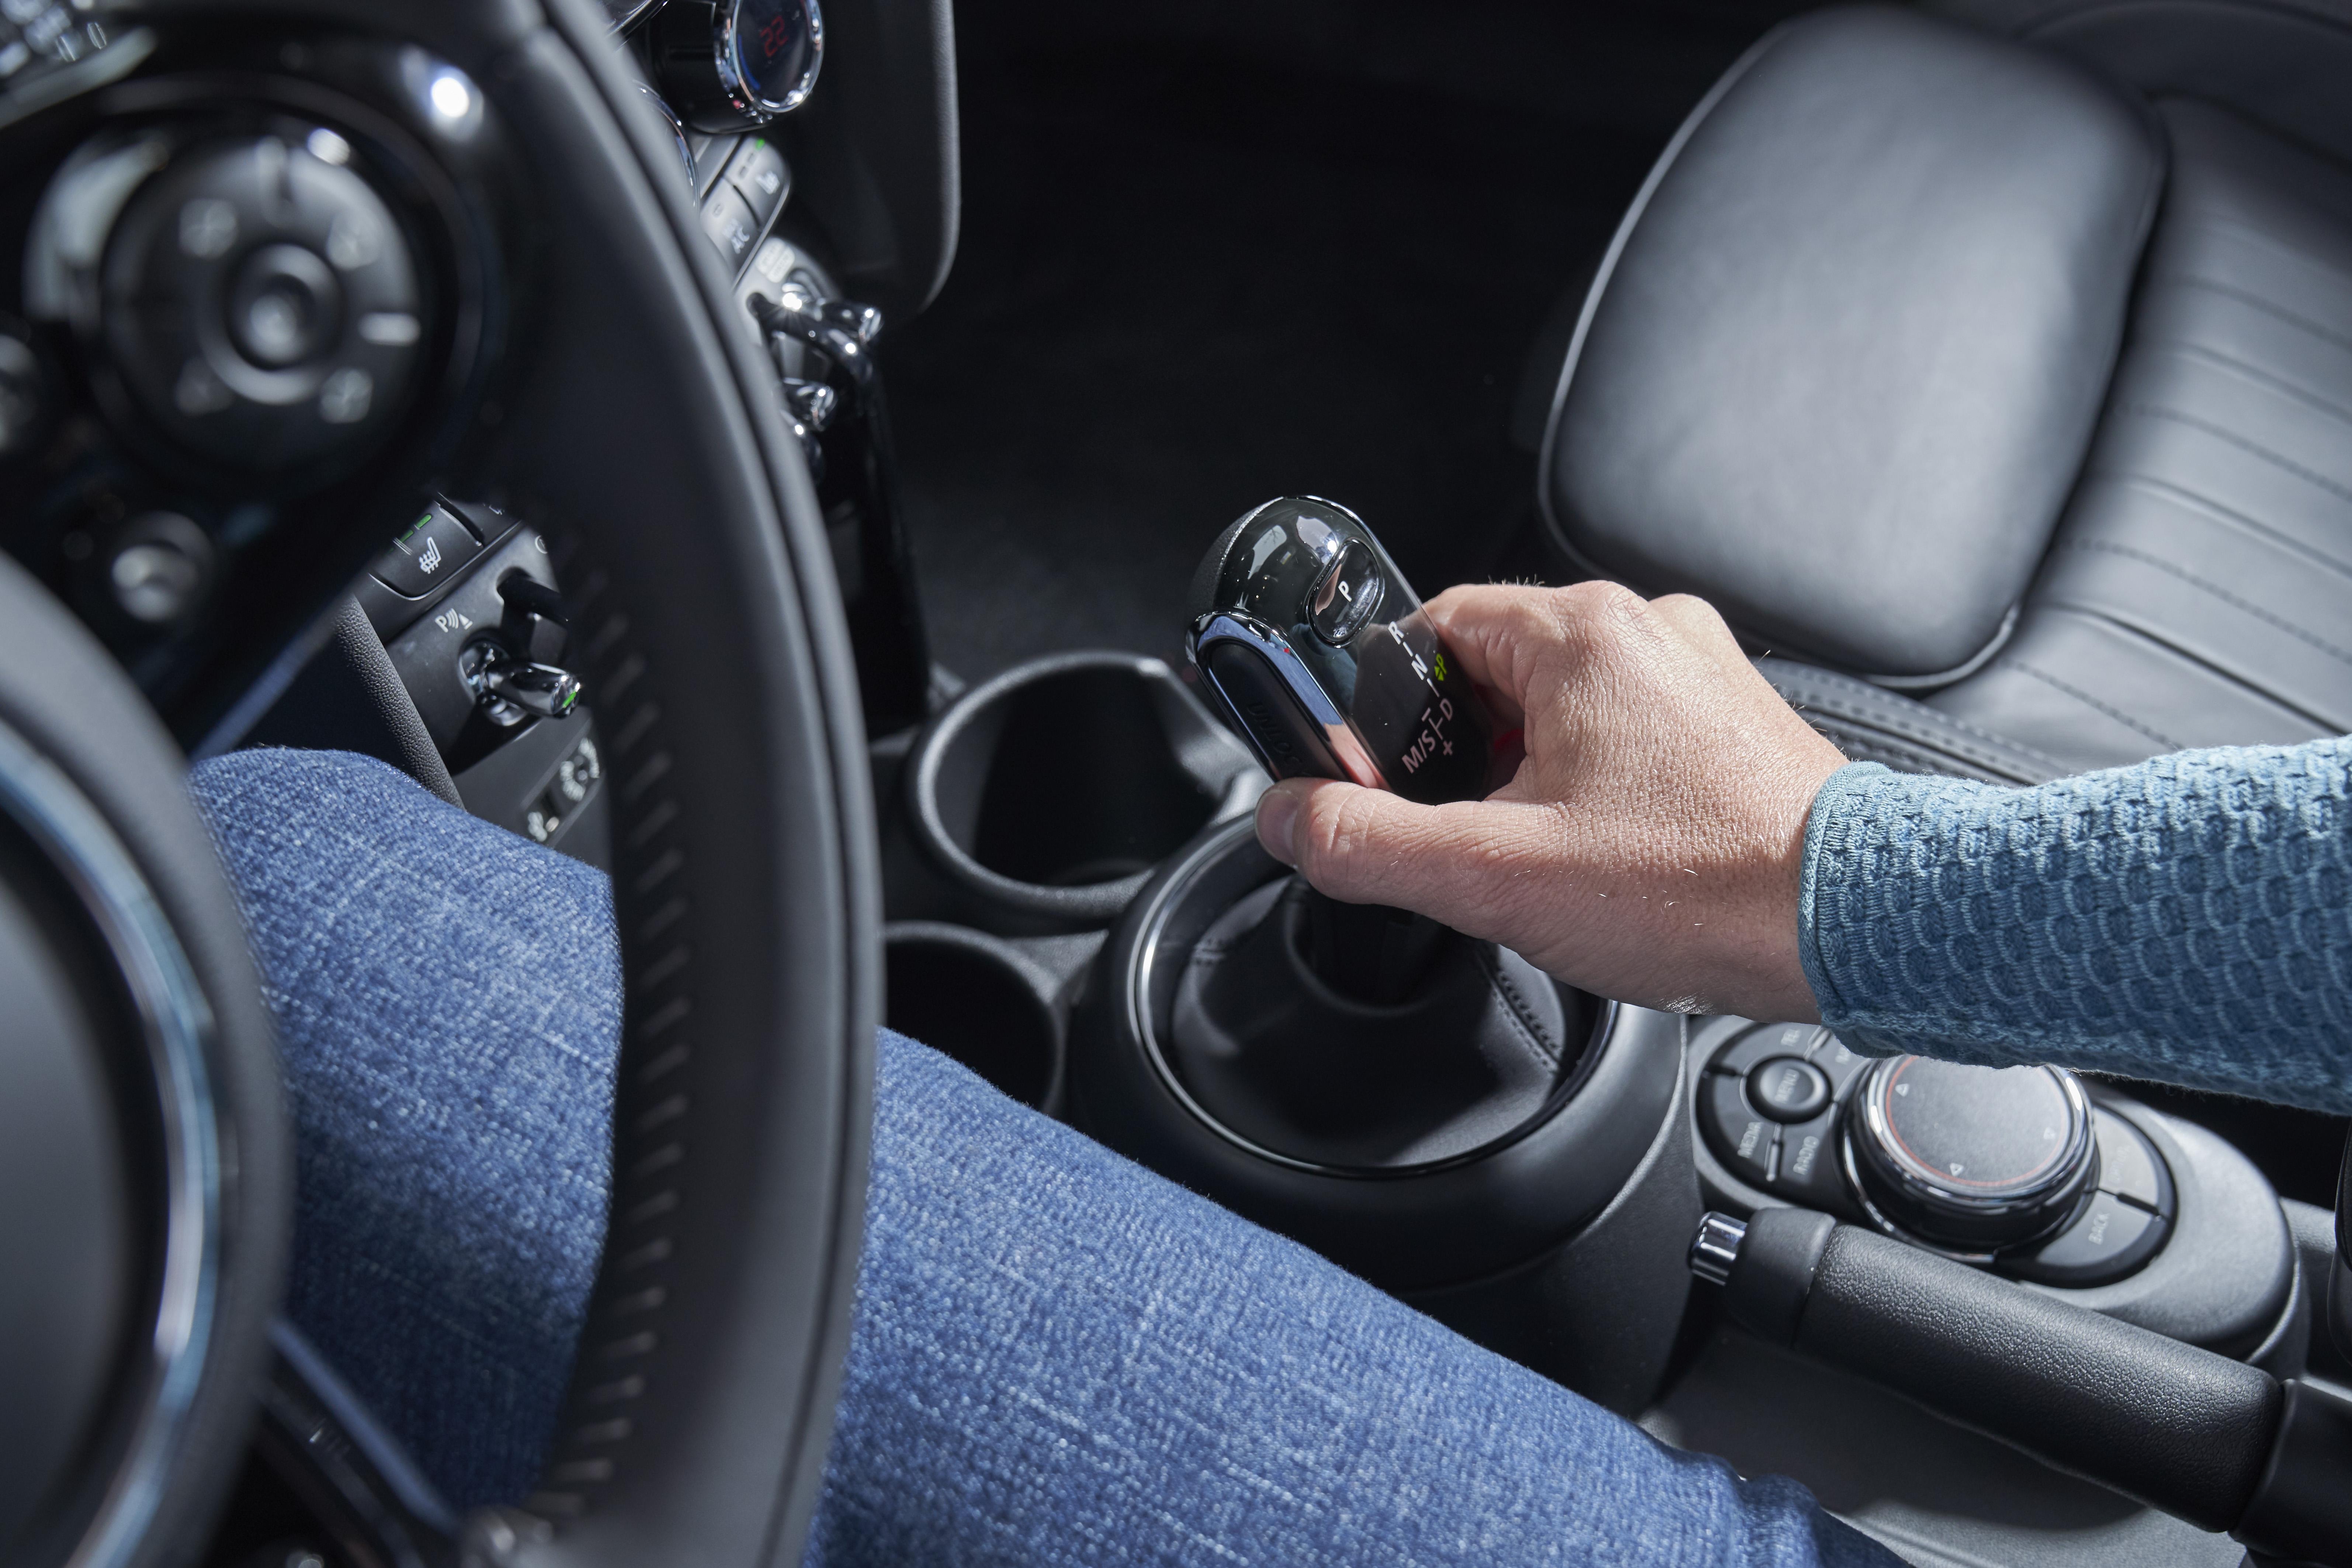 MINI double clutch transmission